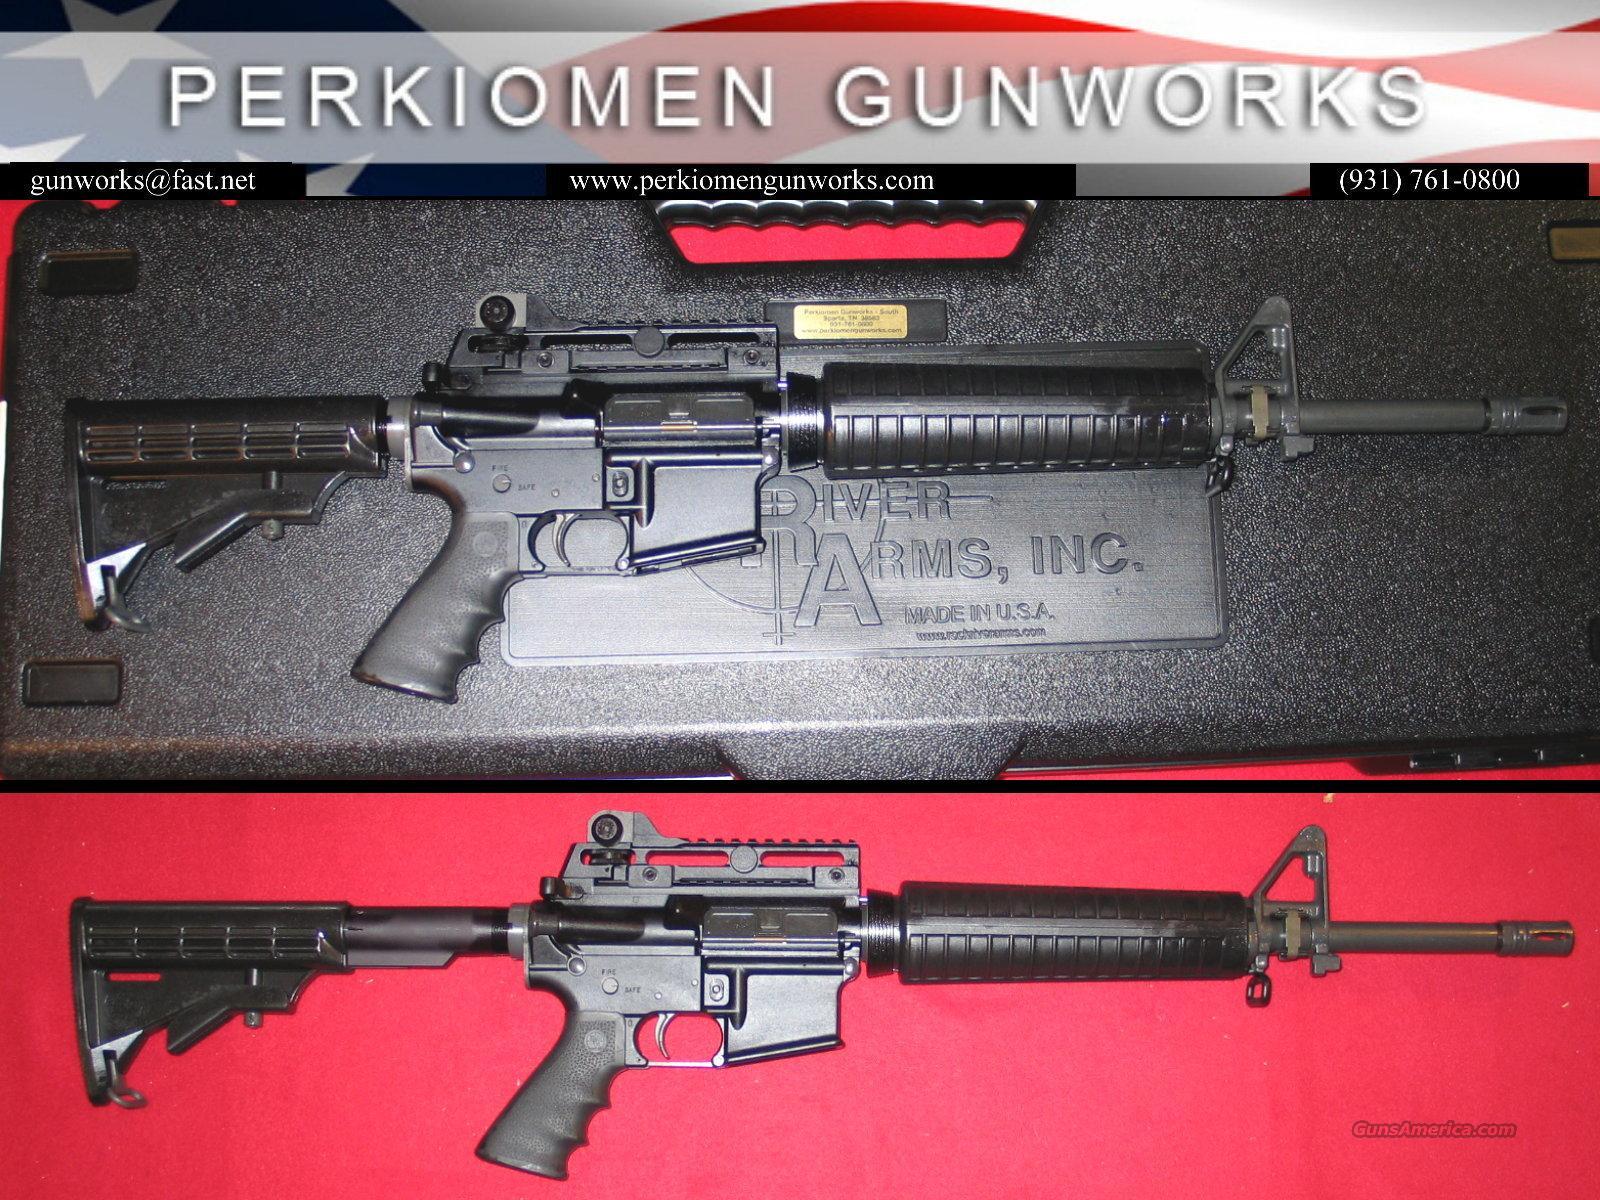 Elite CAR A4 5.56 w/Tacticial Handle included - NIB  Guns > Rifles > Rock River Arms Rifles